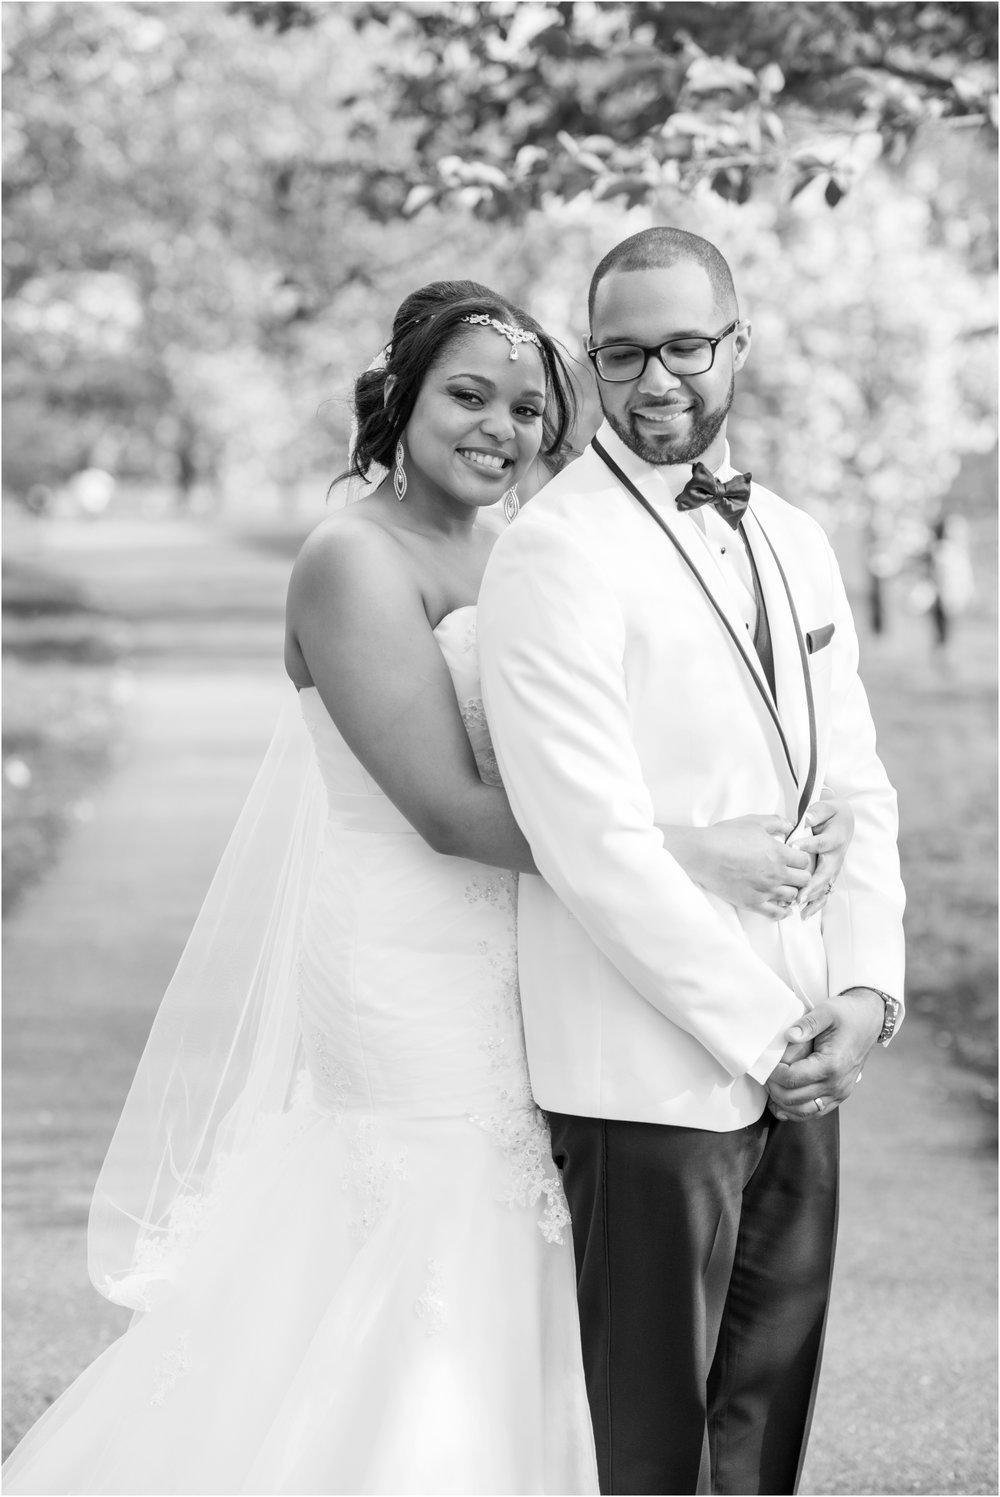 jaclyn-auletta-photography-blog-north-carolina-wedding-photographer-blogger_0045.jpg